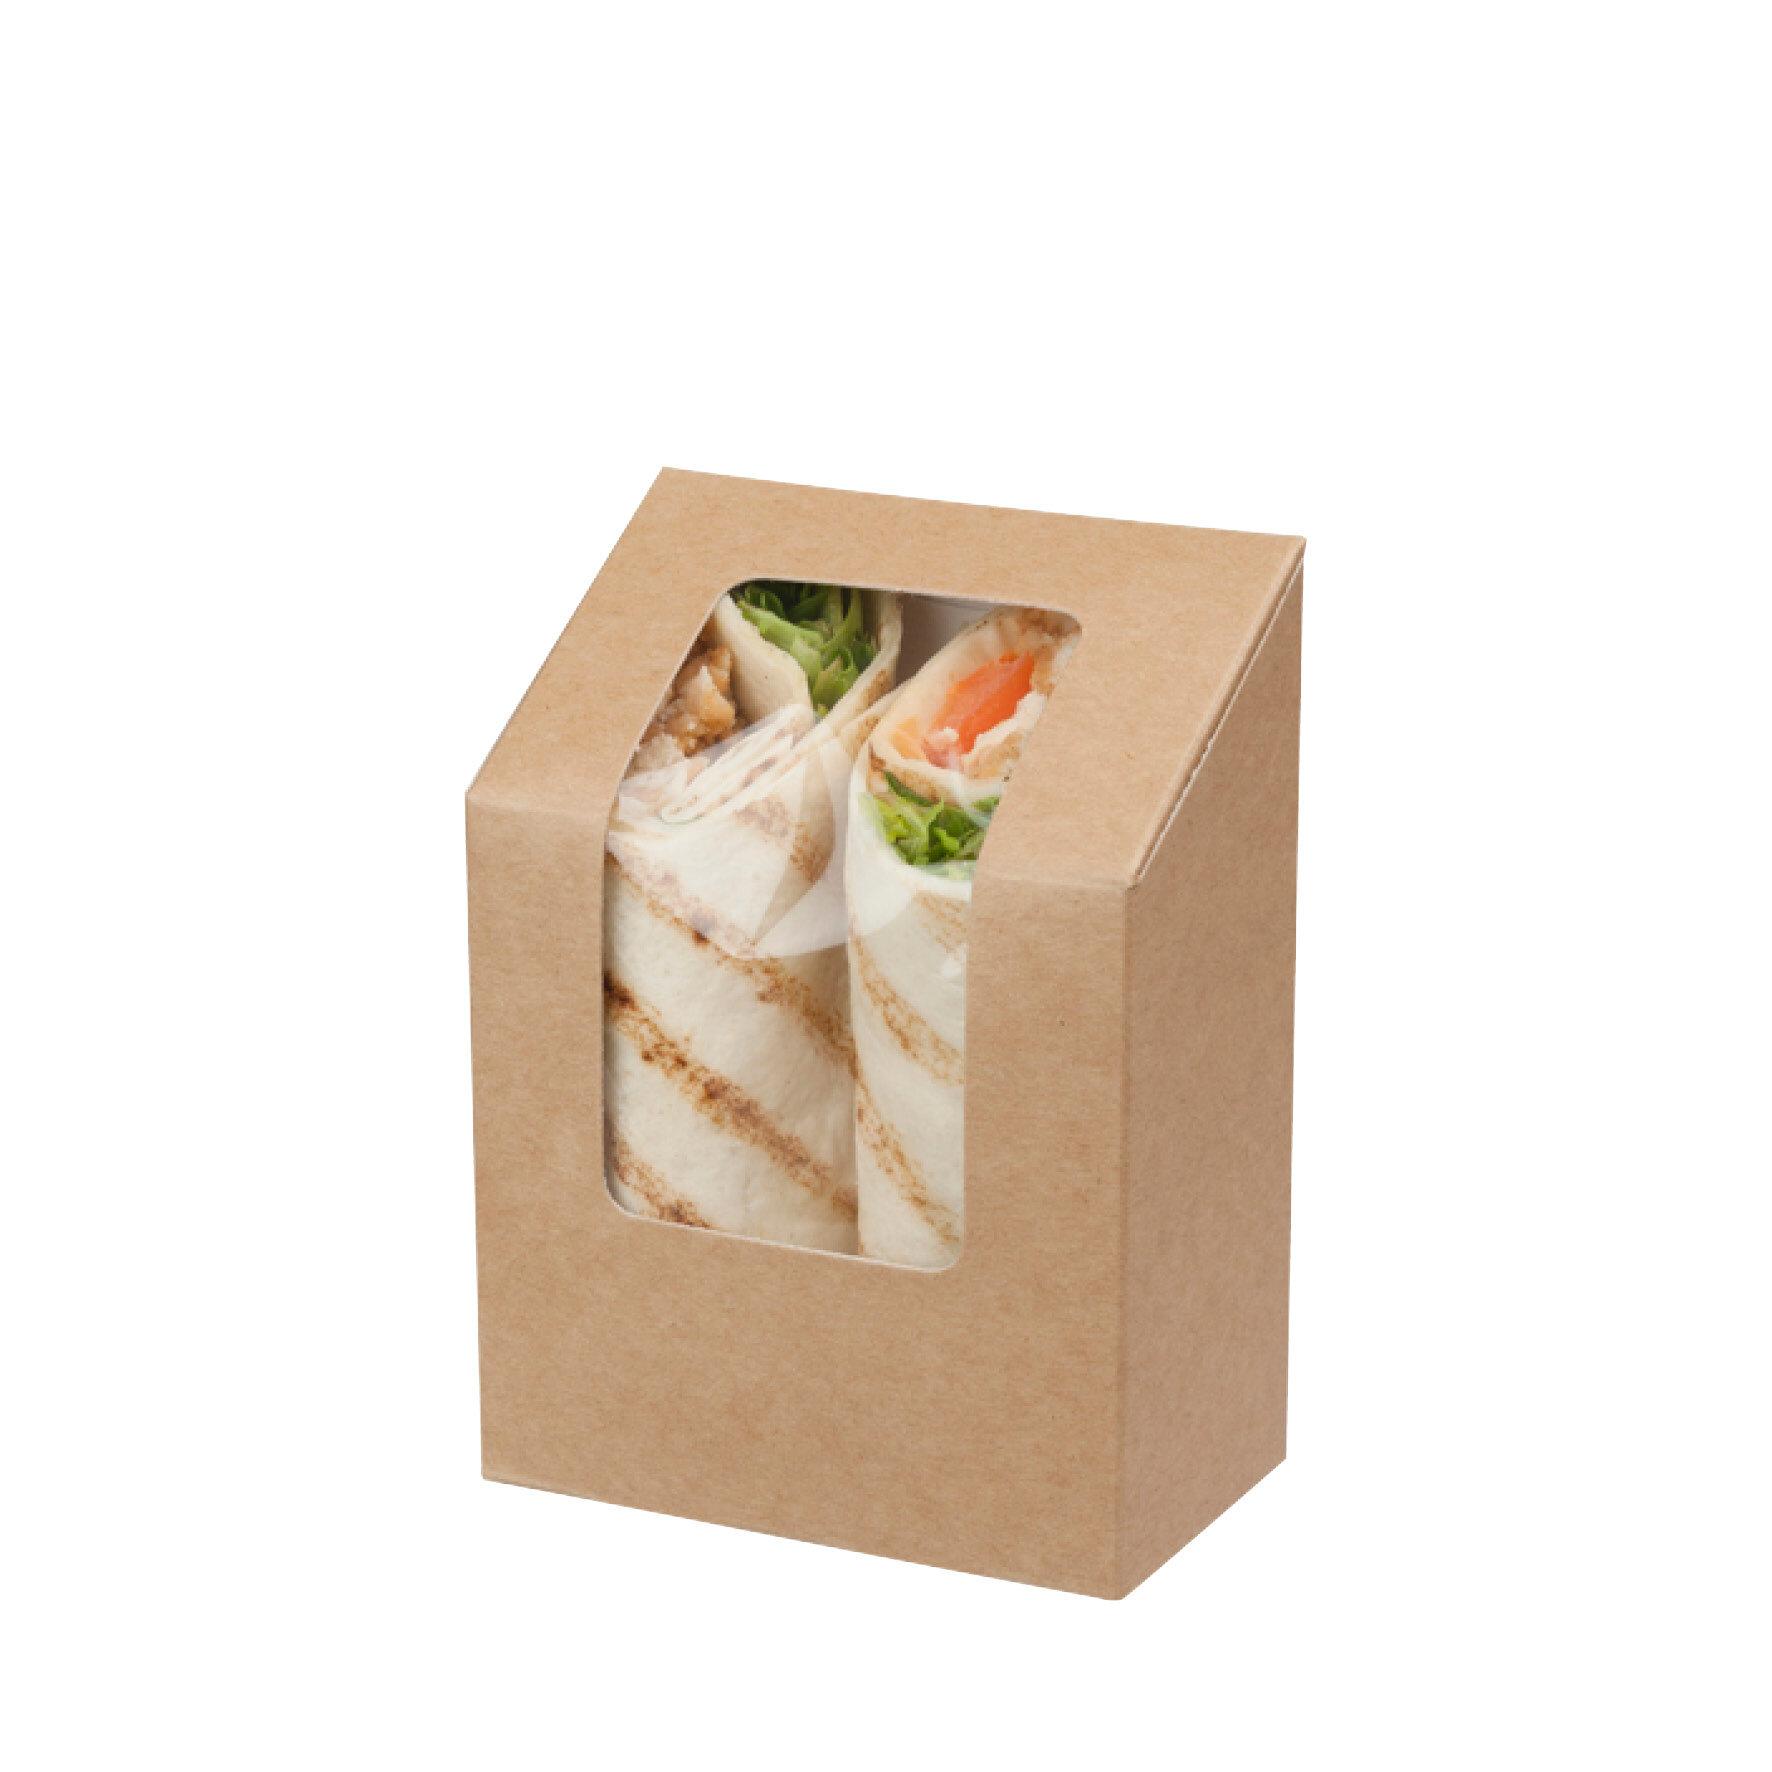 WEBAbox  Wrap Box  mit Zellglas-Sichtfenster    Faltbox, Monomaterial (Holz), kompostierbar